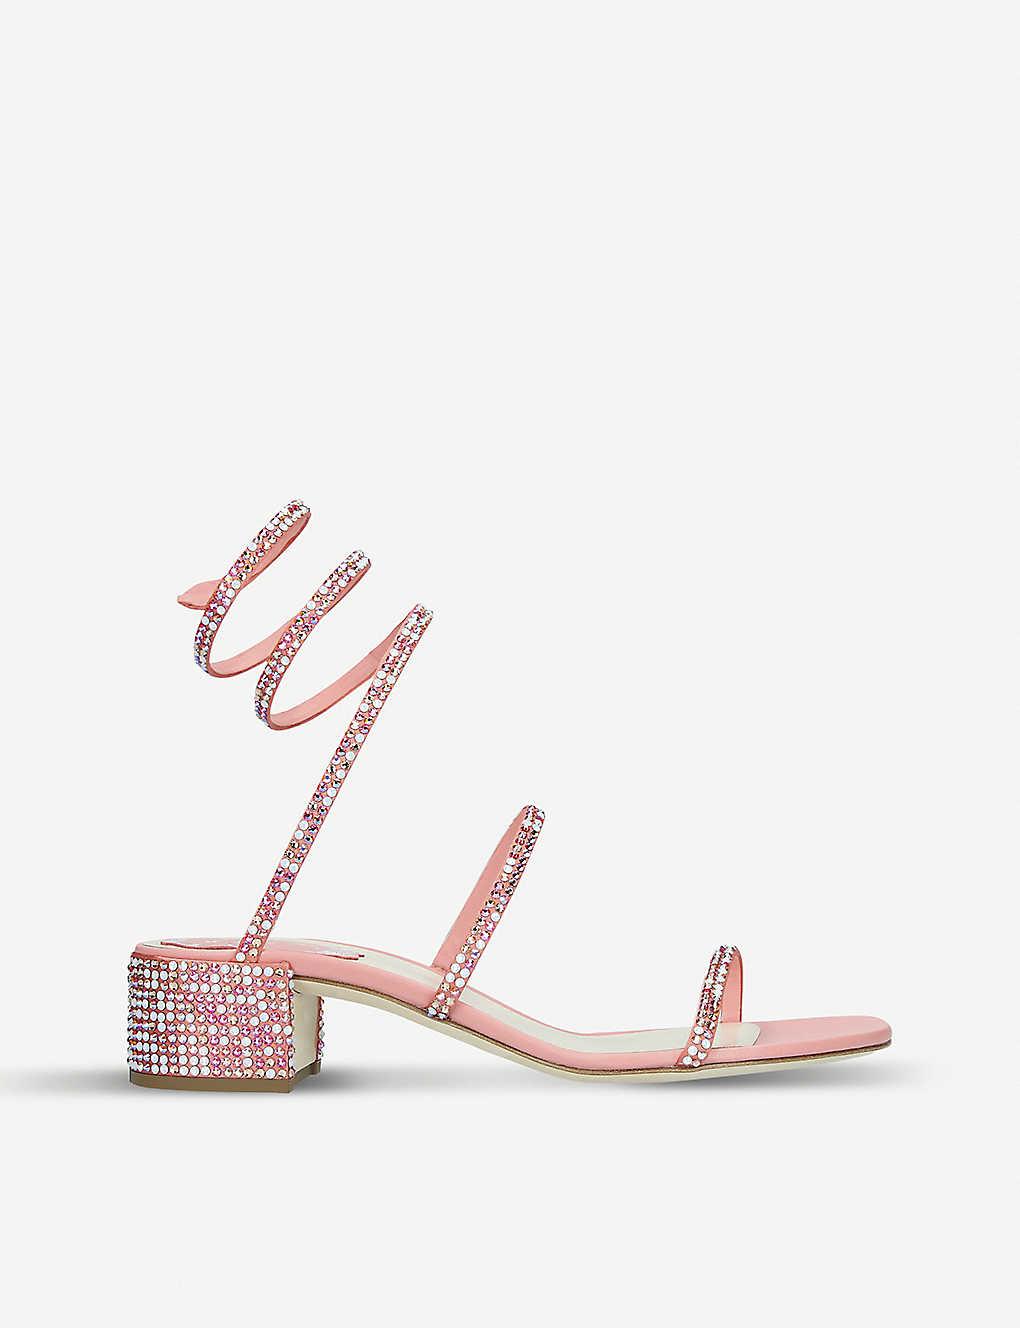 5f3b93a2c6a Cleo crystal-embellished satin sandals